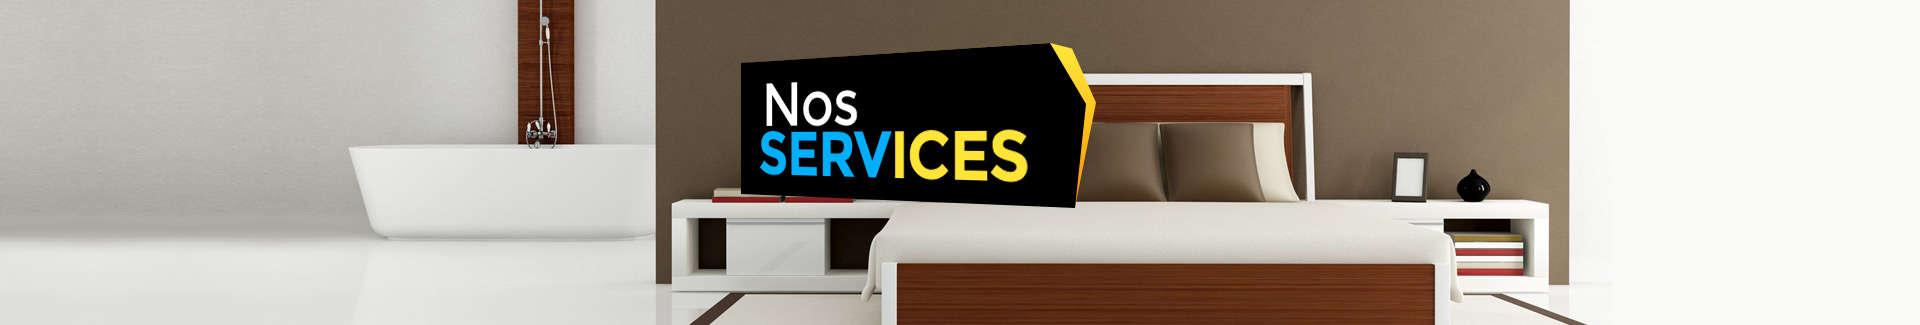 services-header-background-fr